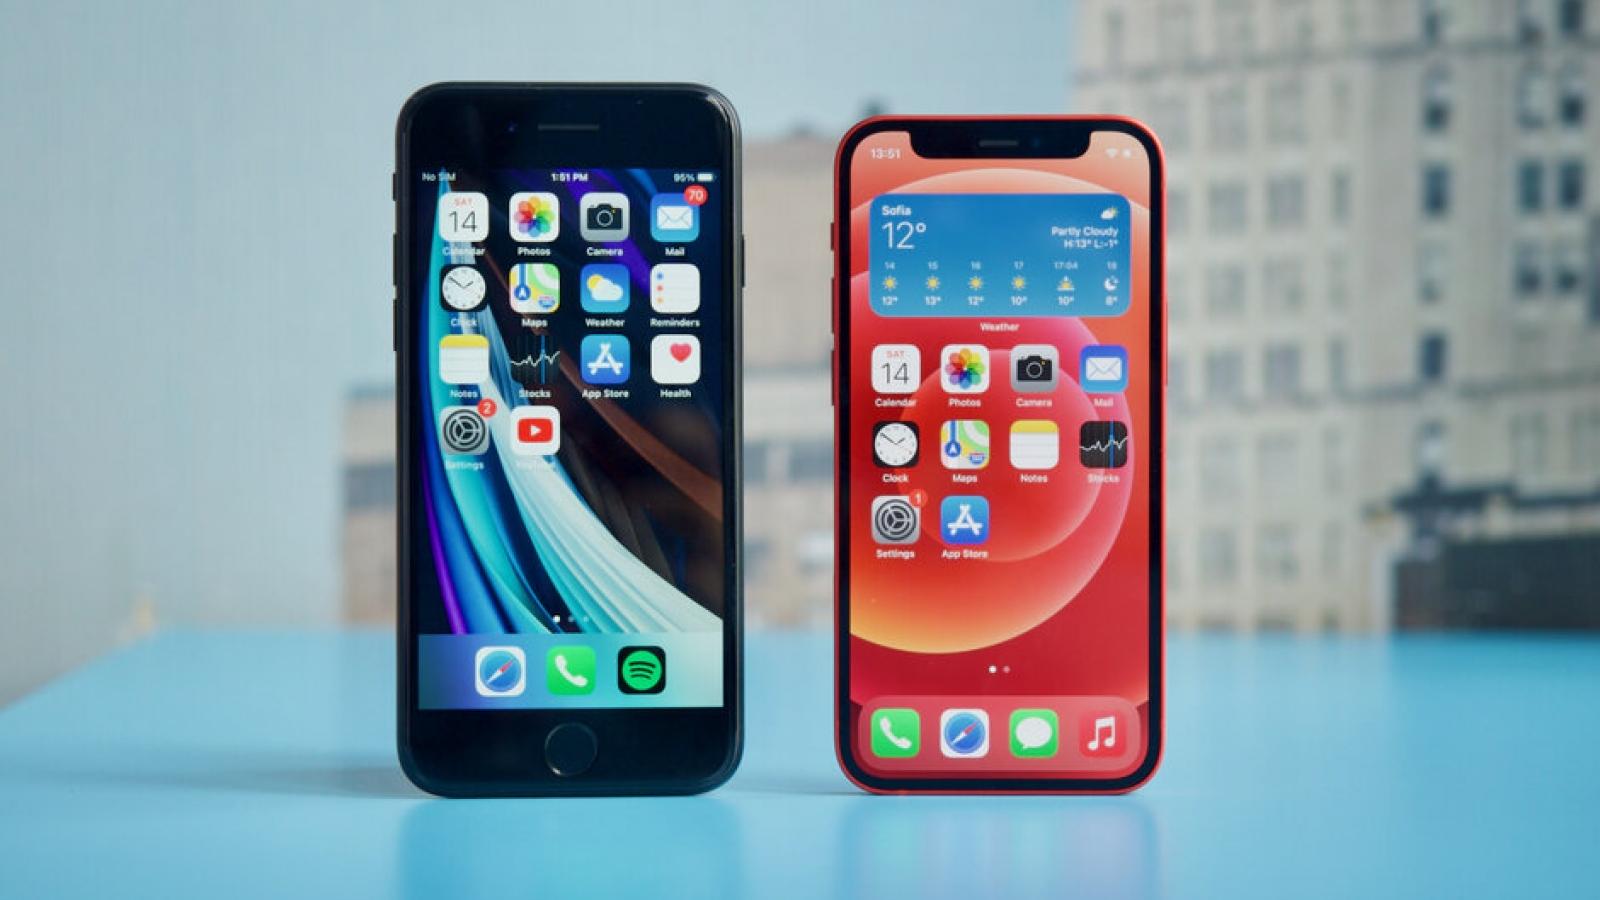 Chọn iPhone 12 mini hay iPhone SE 2020 khi chênh nhau 9 triệu đồng?